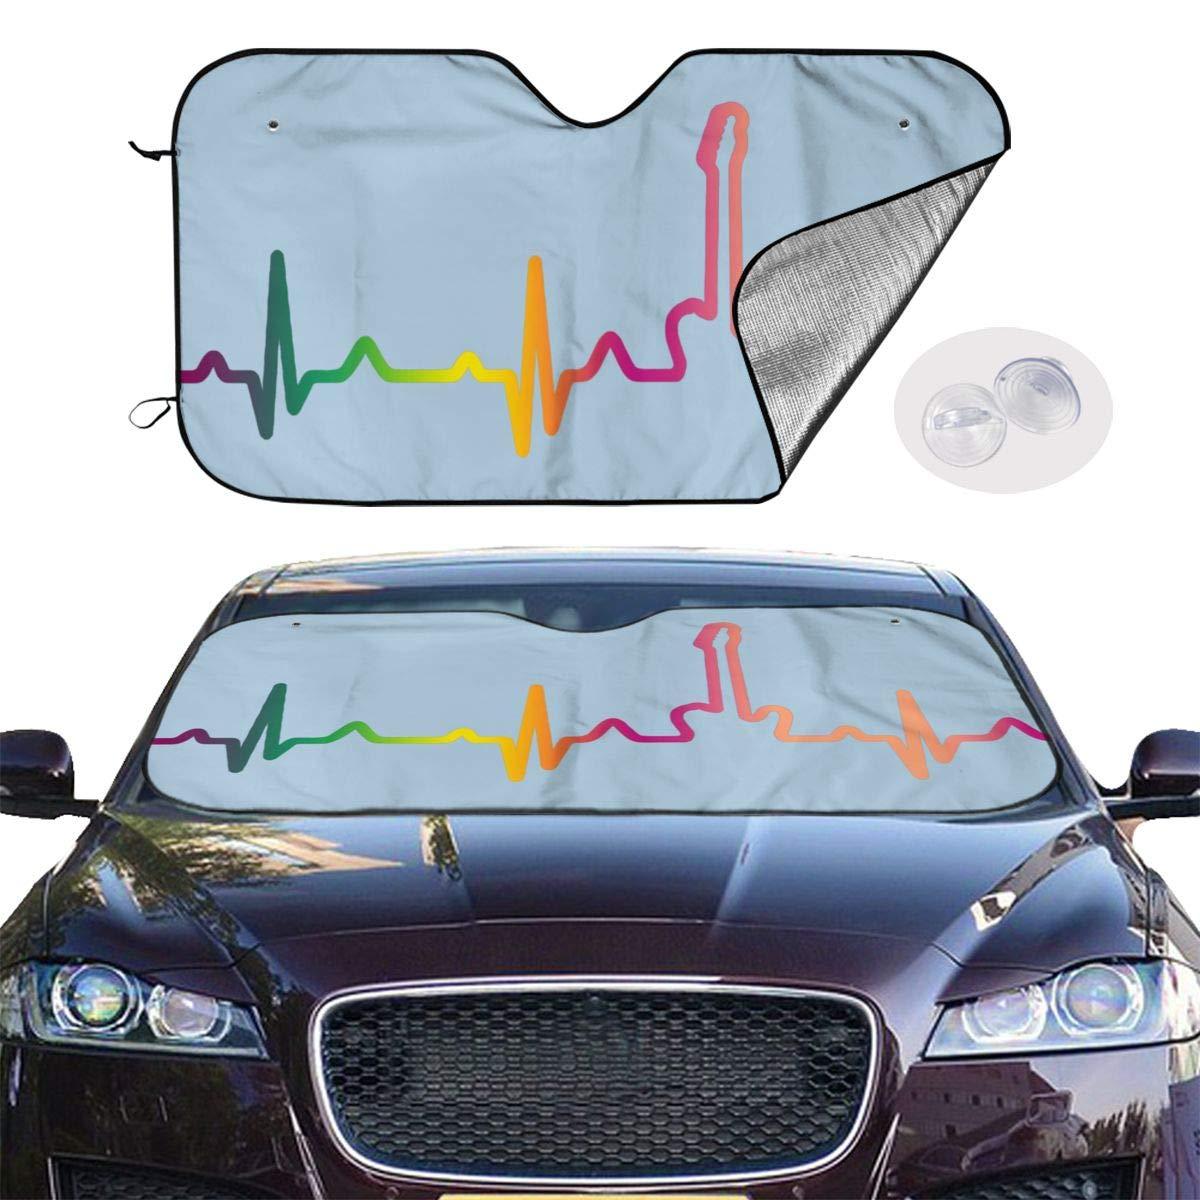 Bass Guitar Player Hearbeat Front Car Windshield Sun Shade Window Windscreen Cover Uv Reflector Keep Vehicle Cool 70x130cm